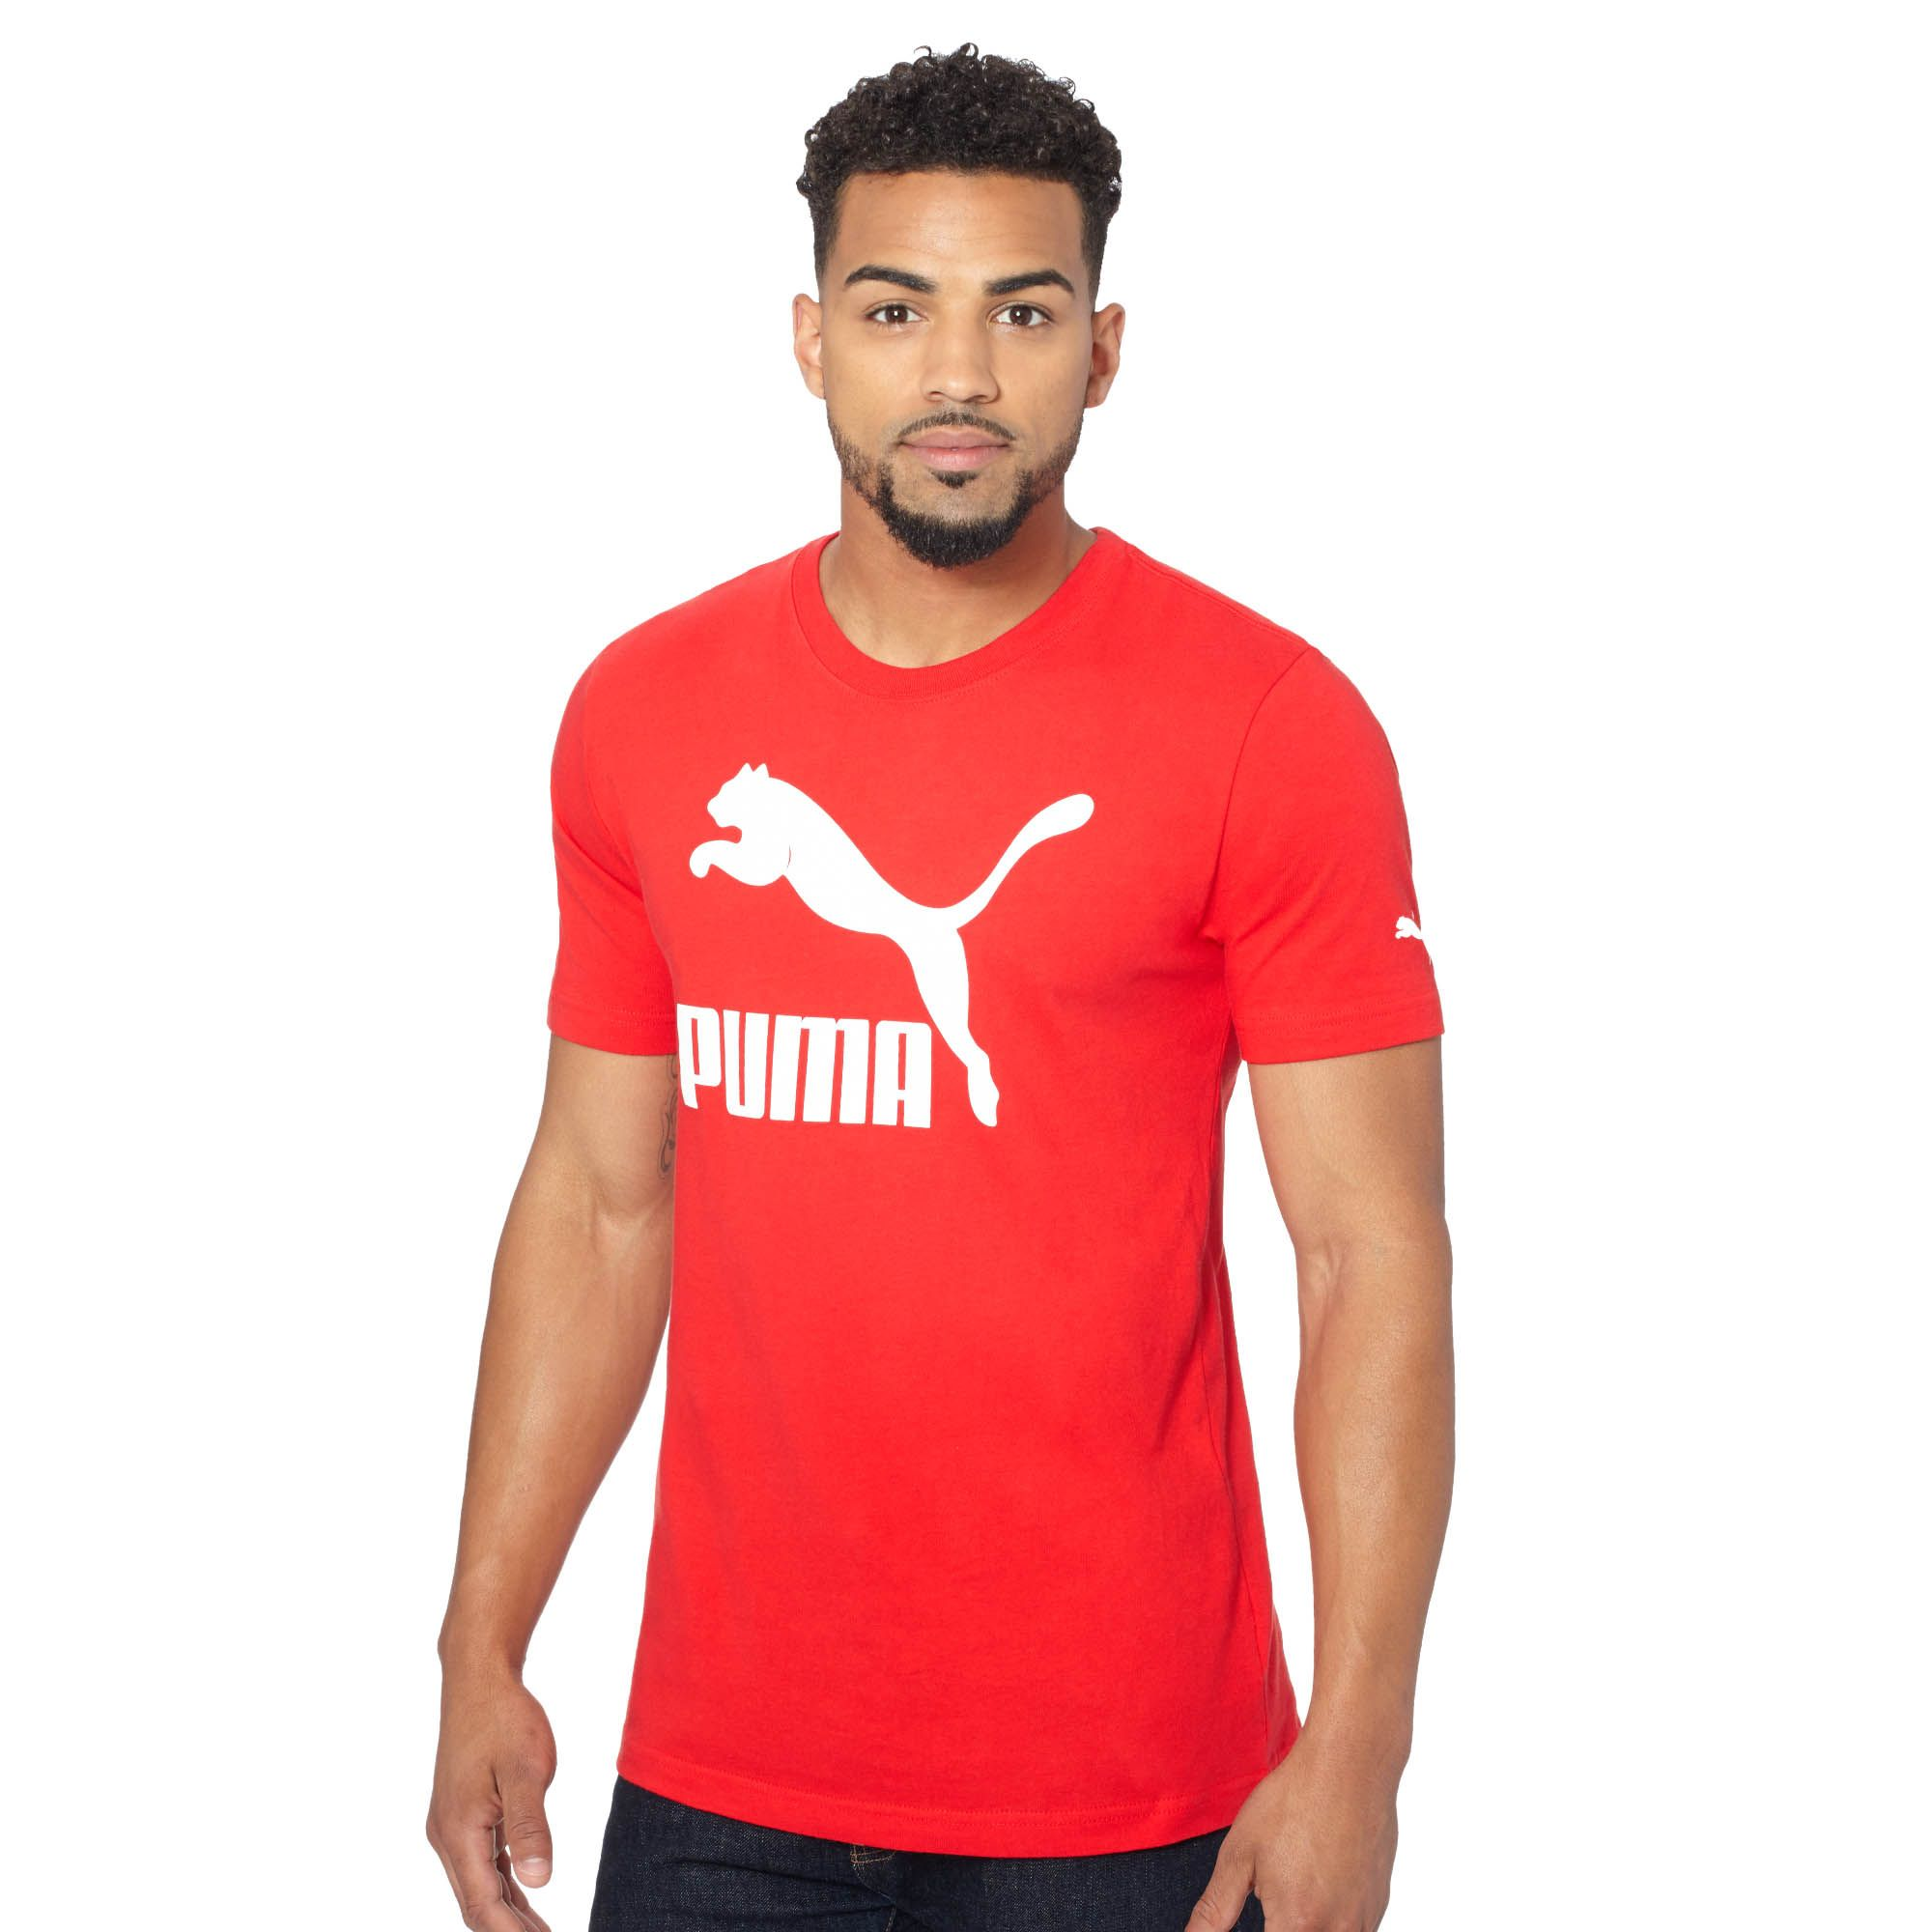 PUMA Archive Life T-Shirt | eBay